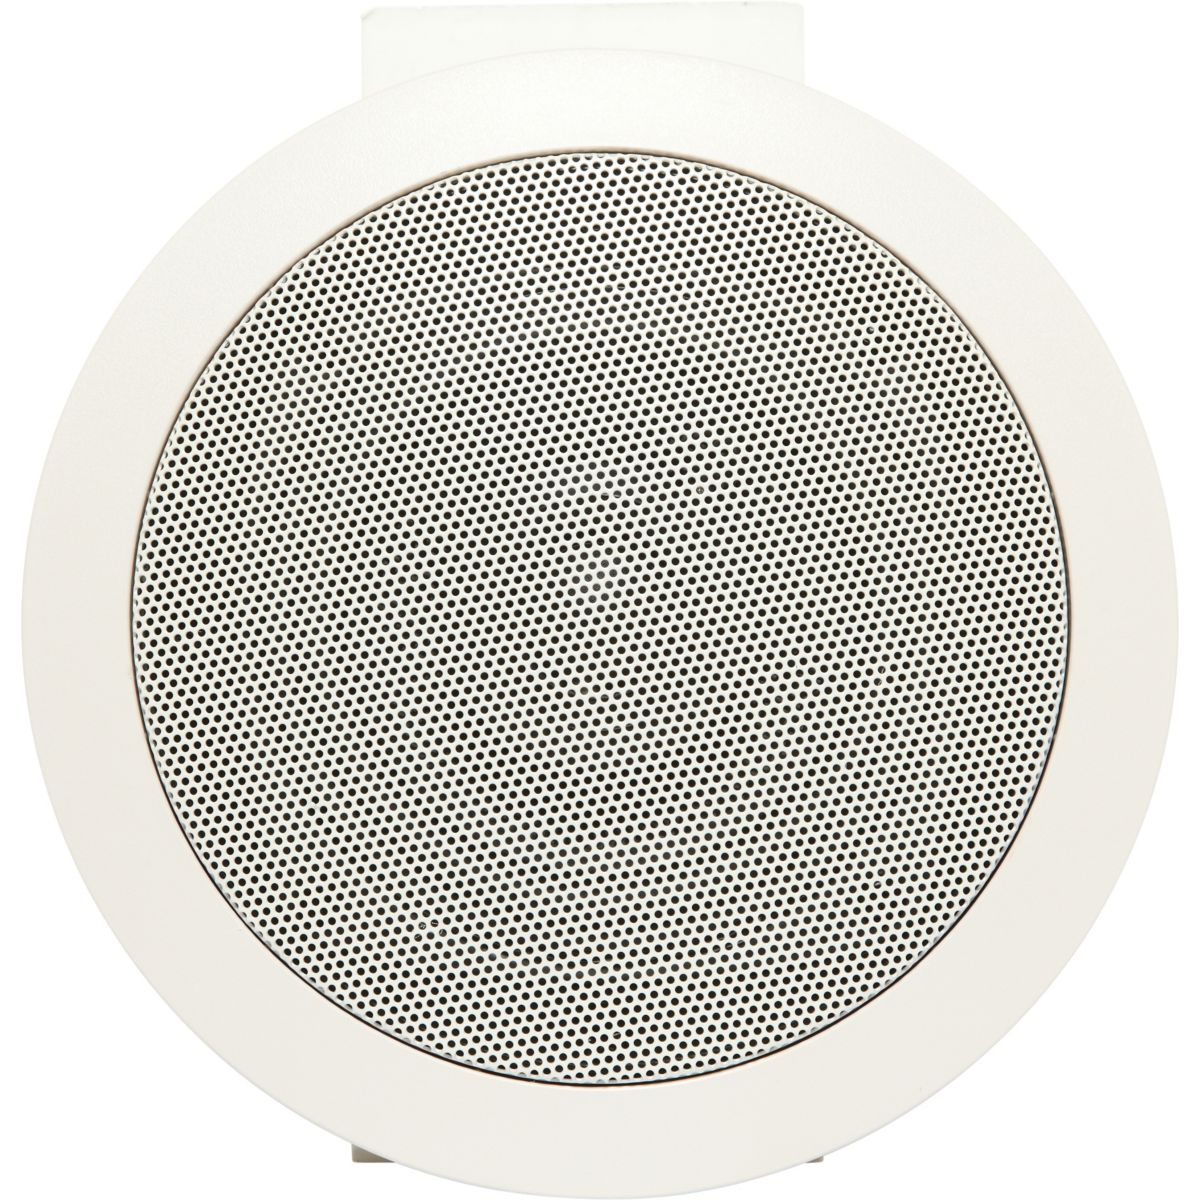 Enceinte encastrable davis 100 ro blanc - livraison offerte : code premium (photo)